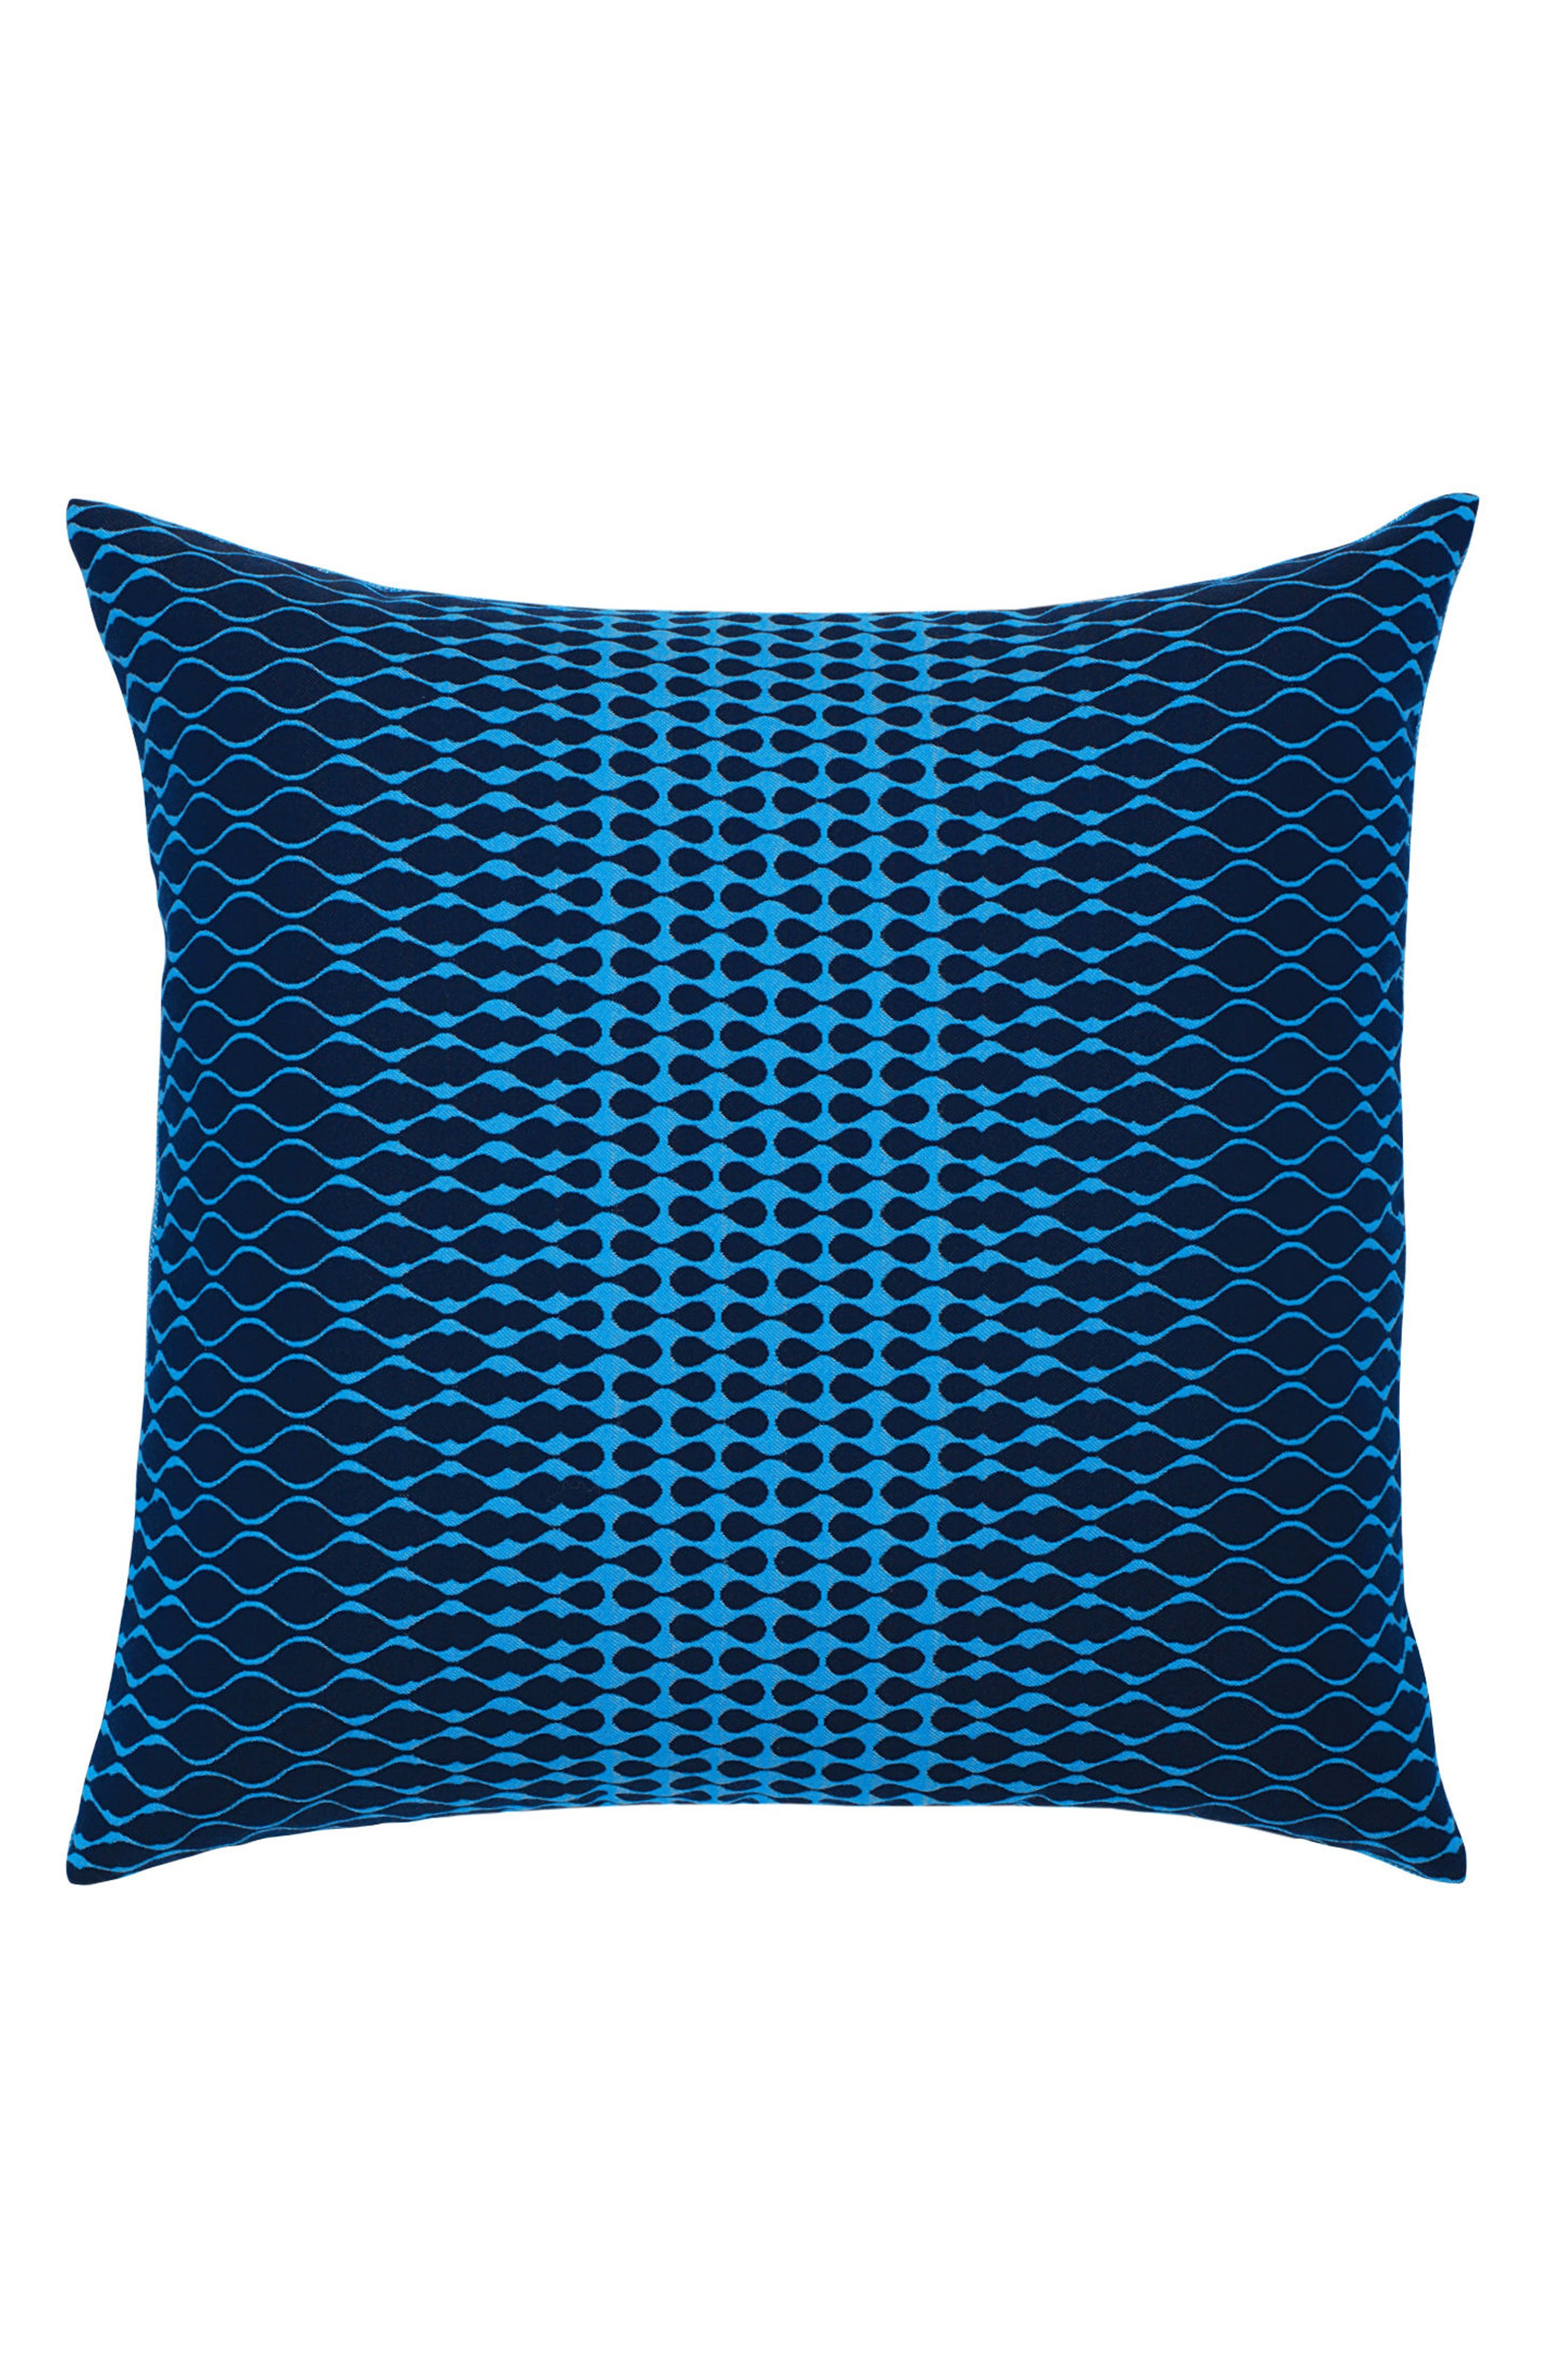 Optic Azure Indoor/Outdoor Accent Pillow,                         Main,                         color, 400